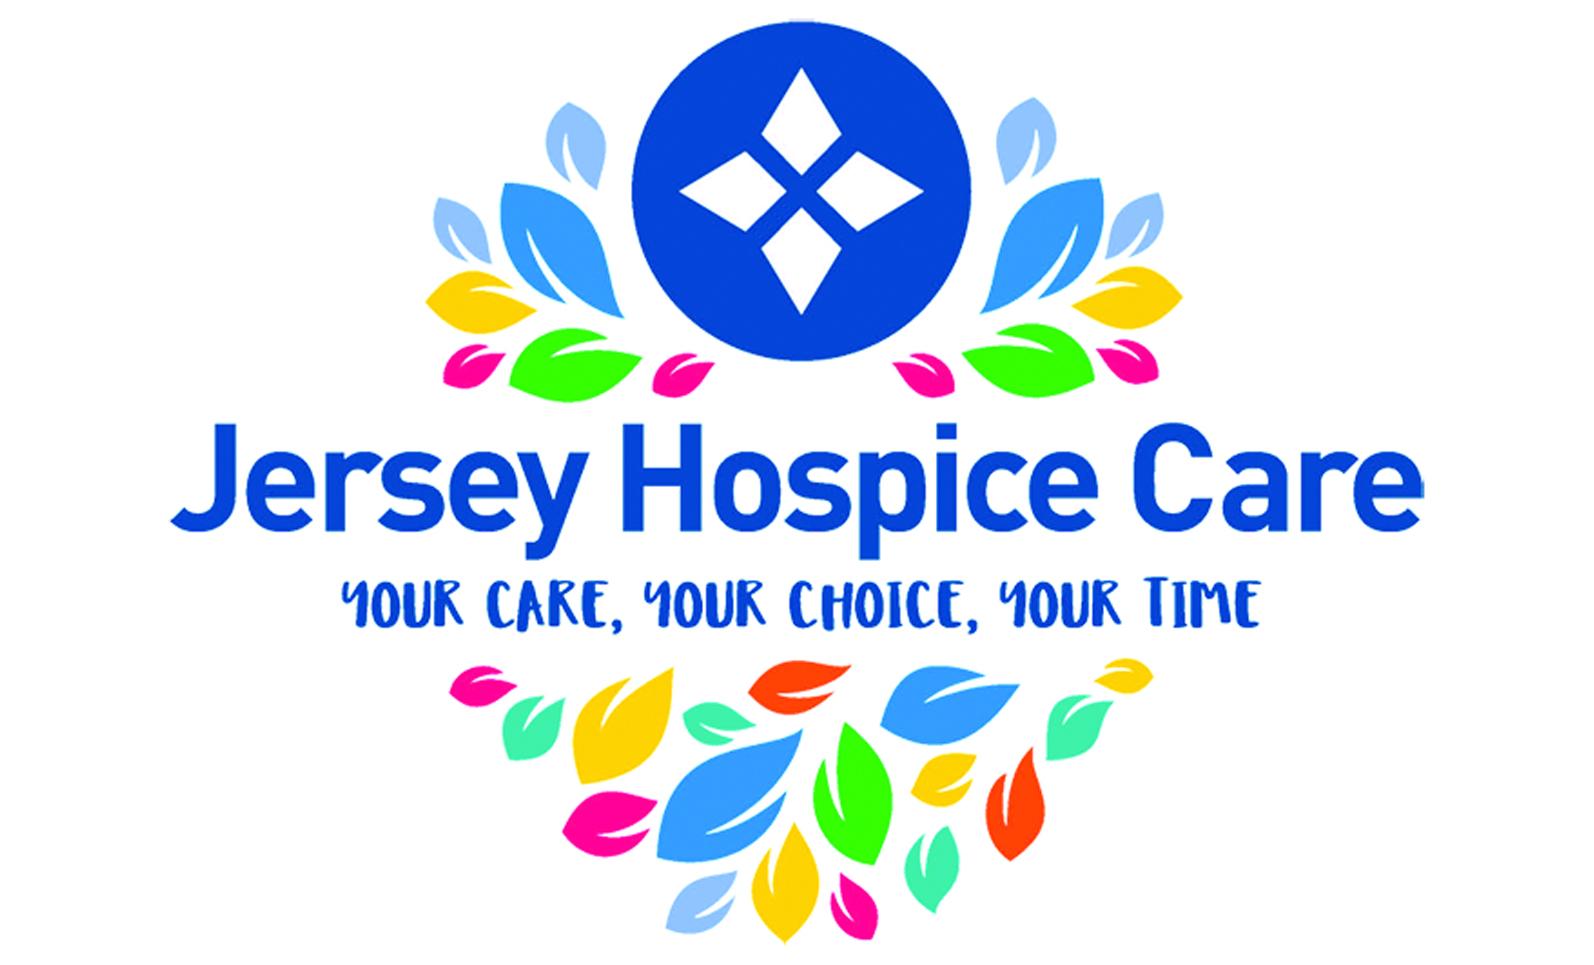 Jersey Hospice Care logo